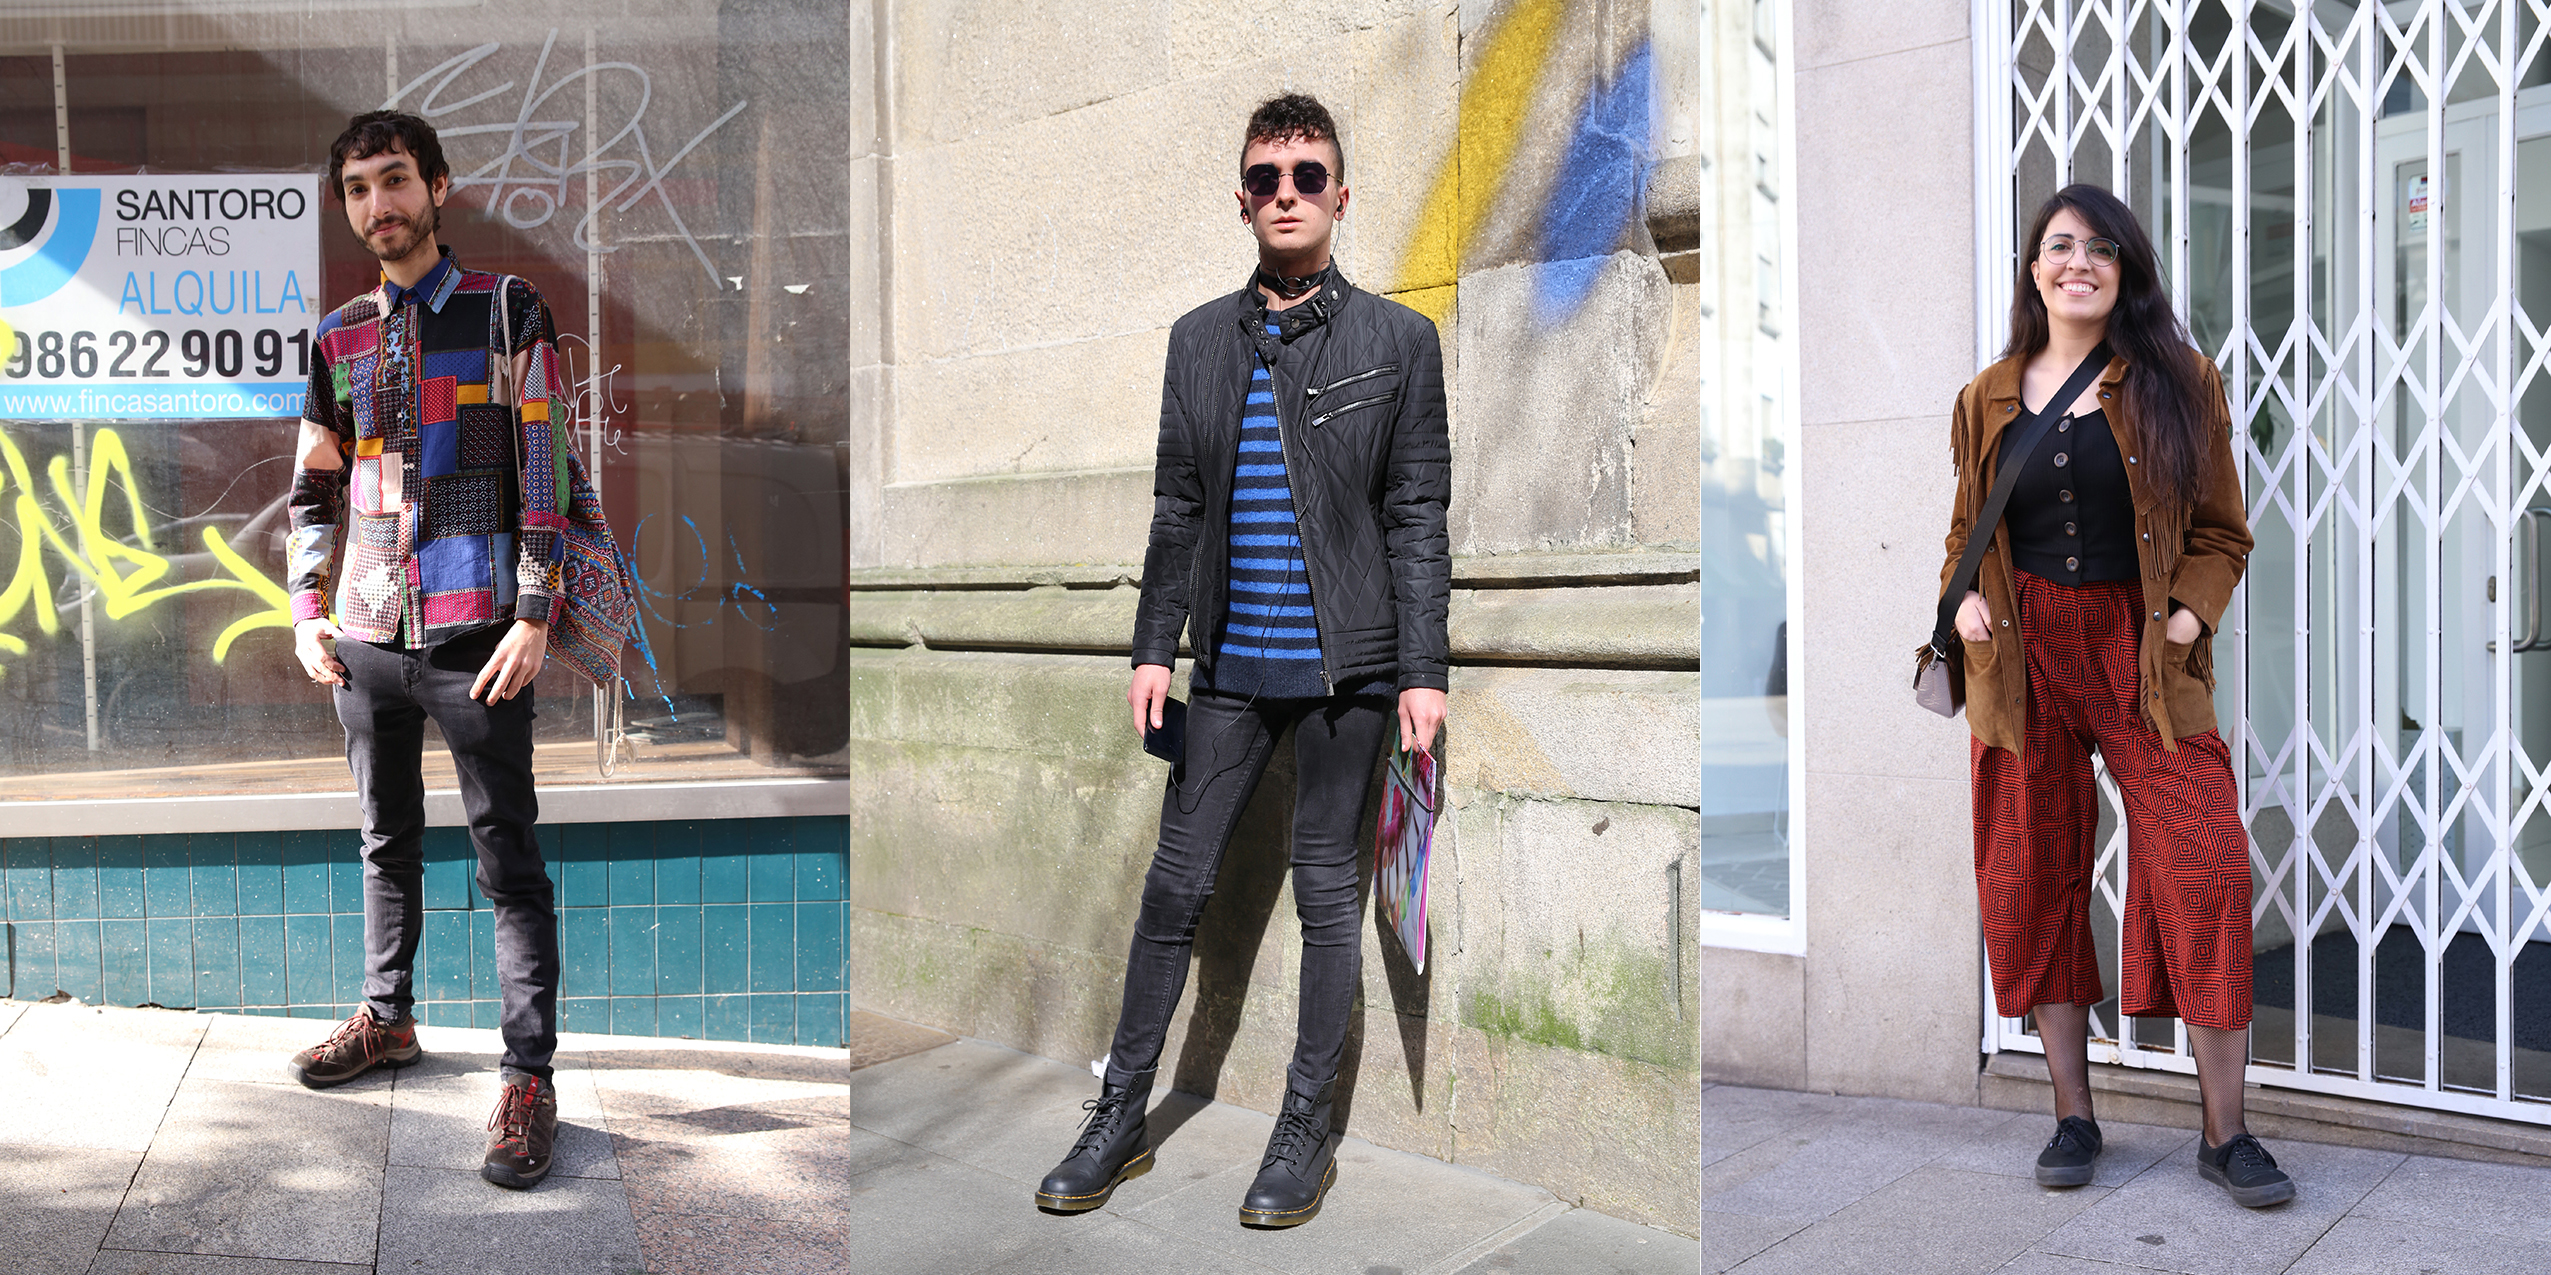 moda na rua abr 19